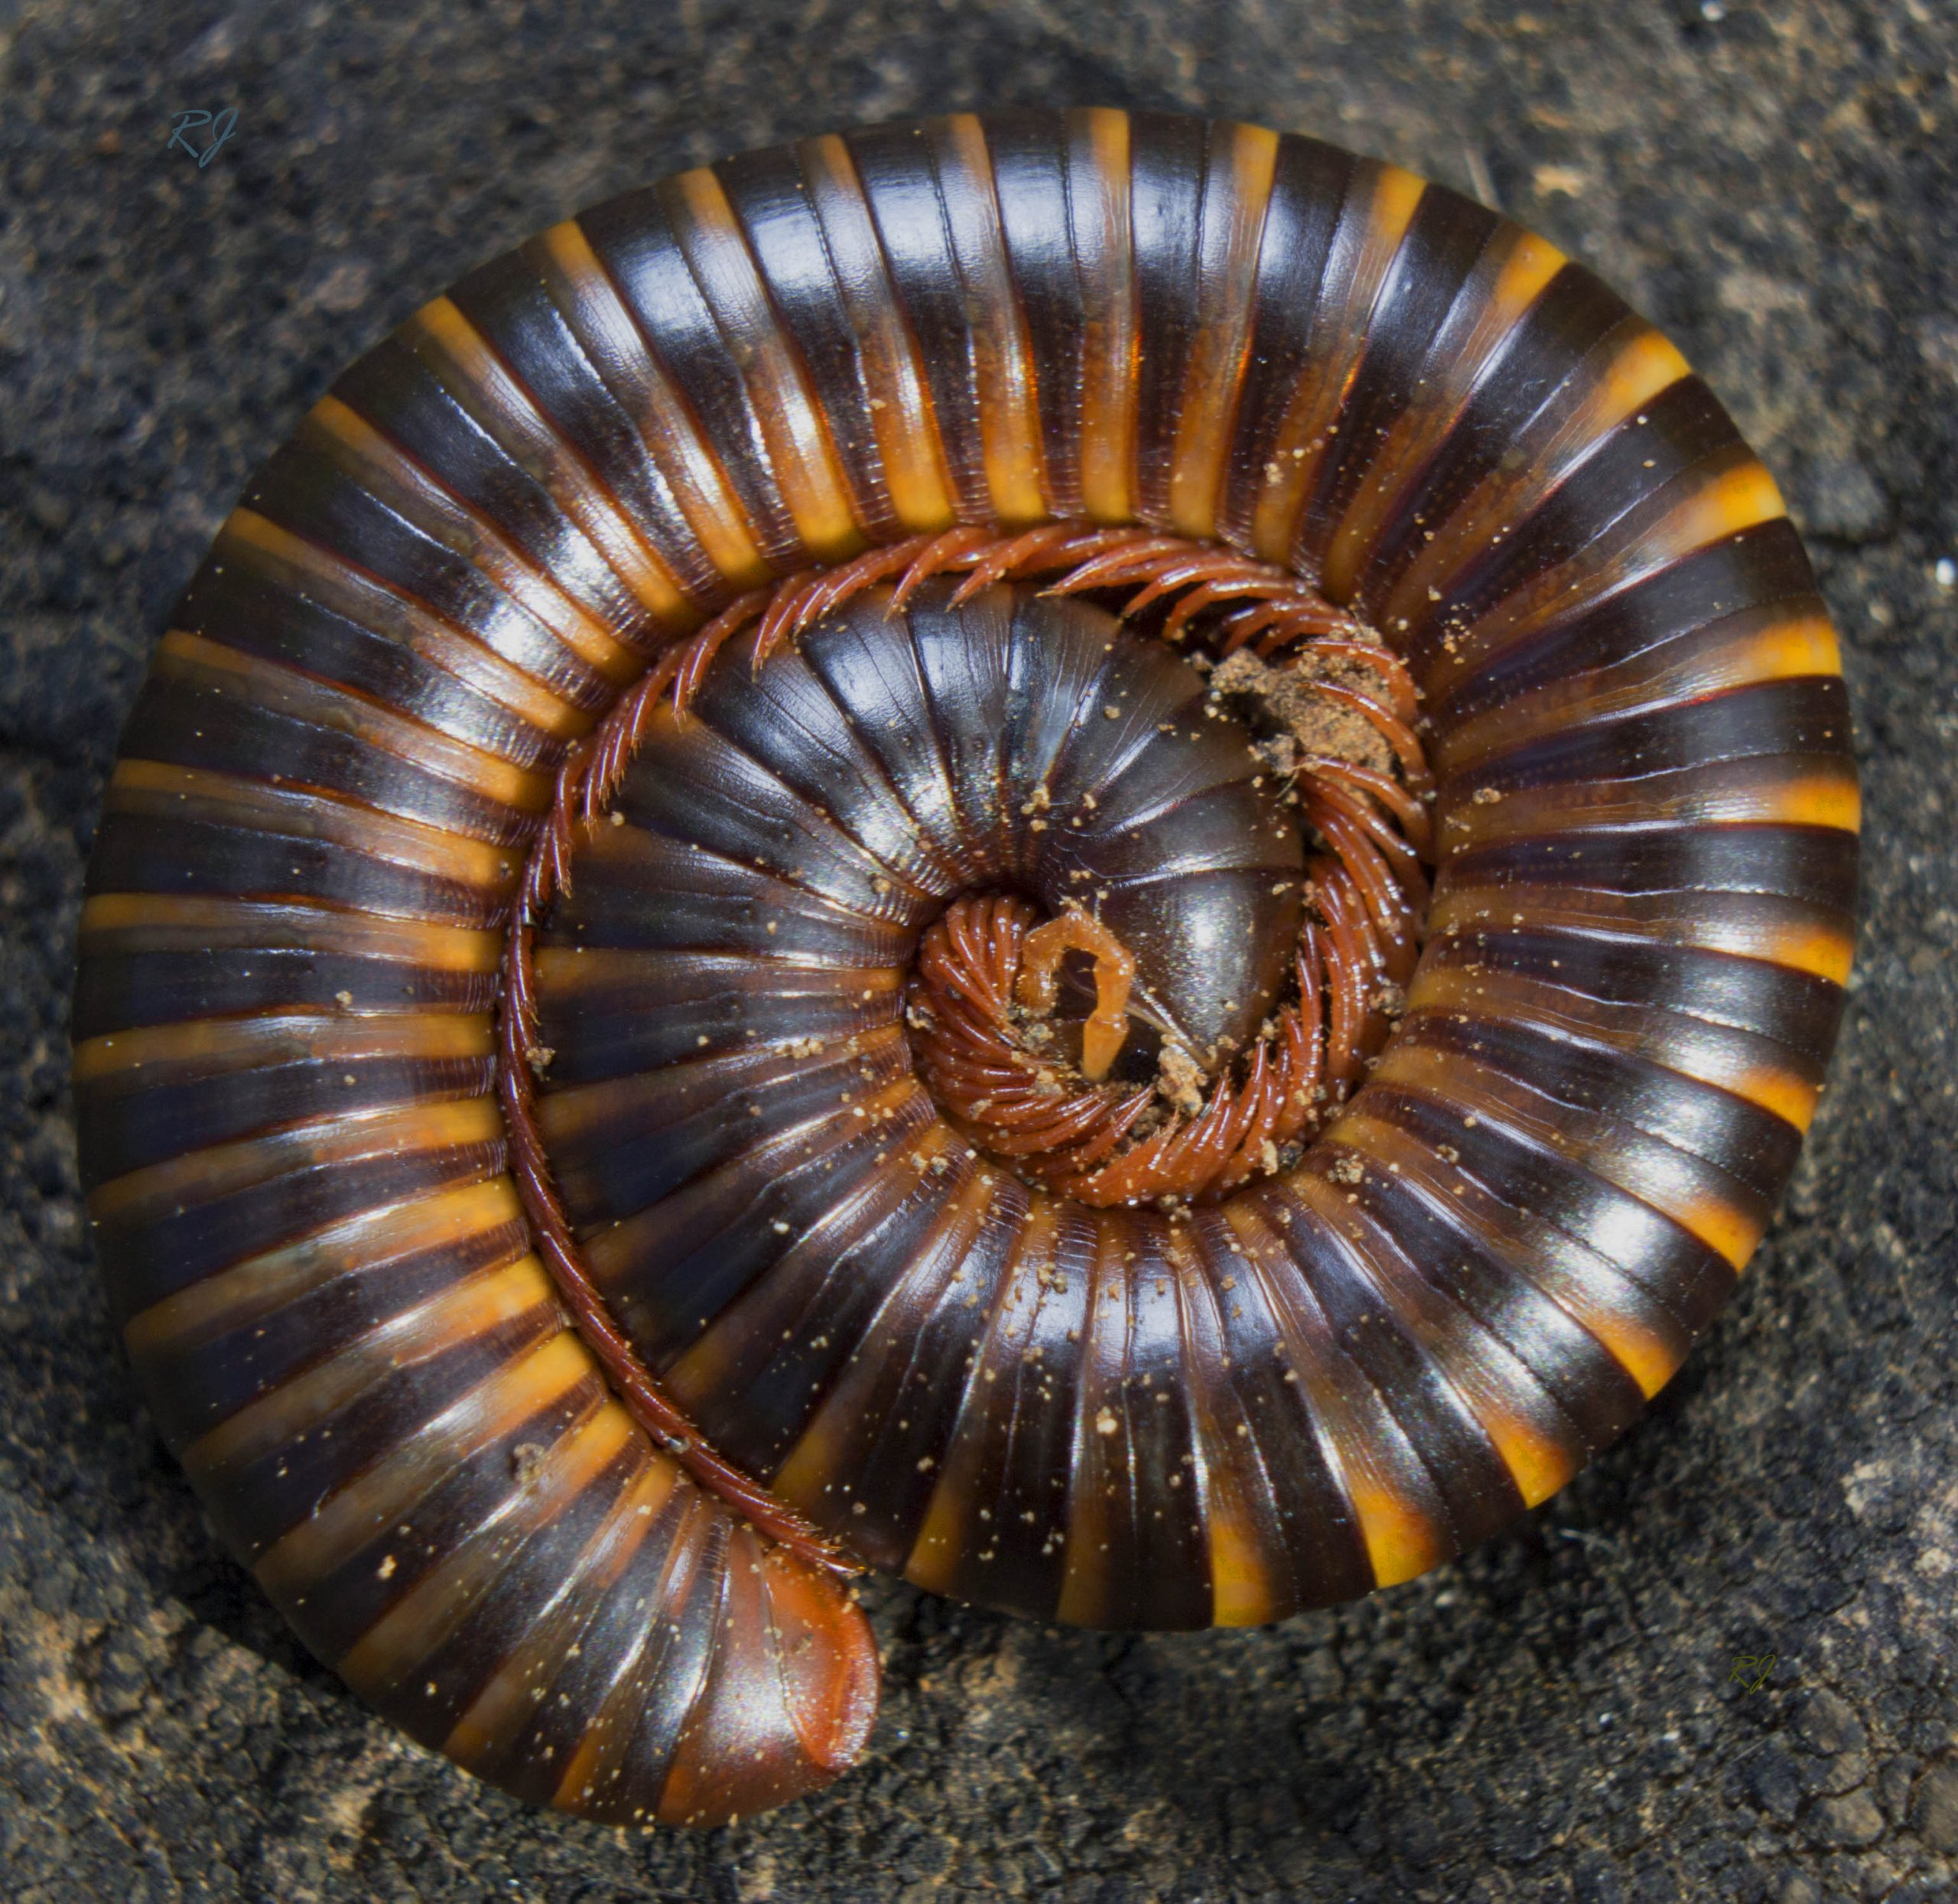 A roll of a millipede